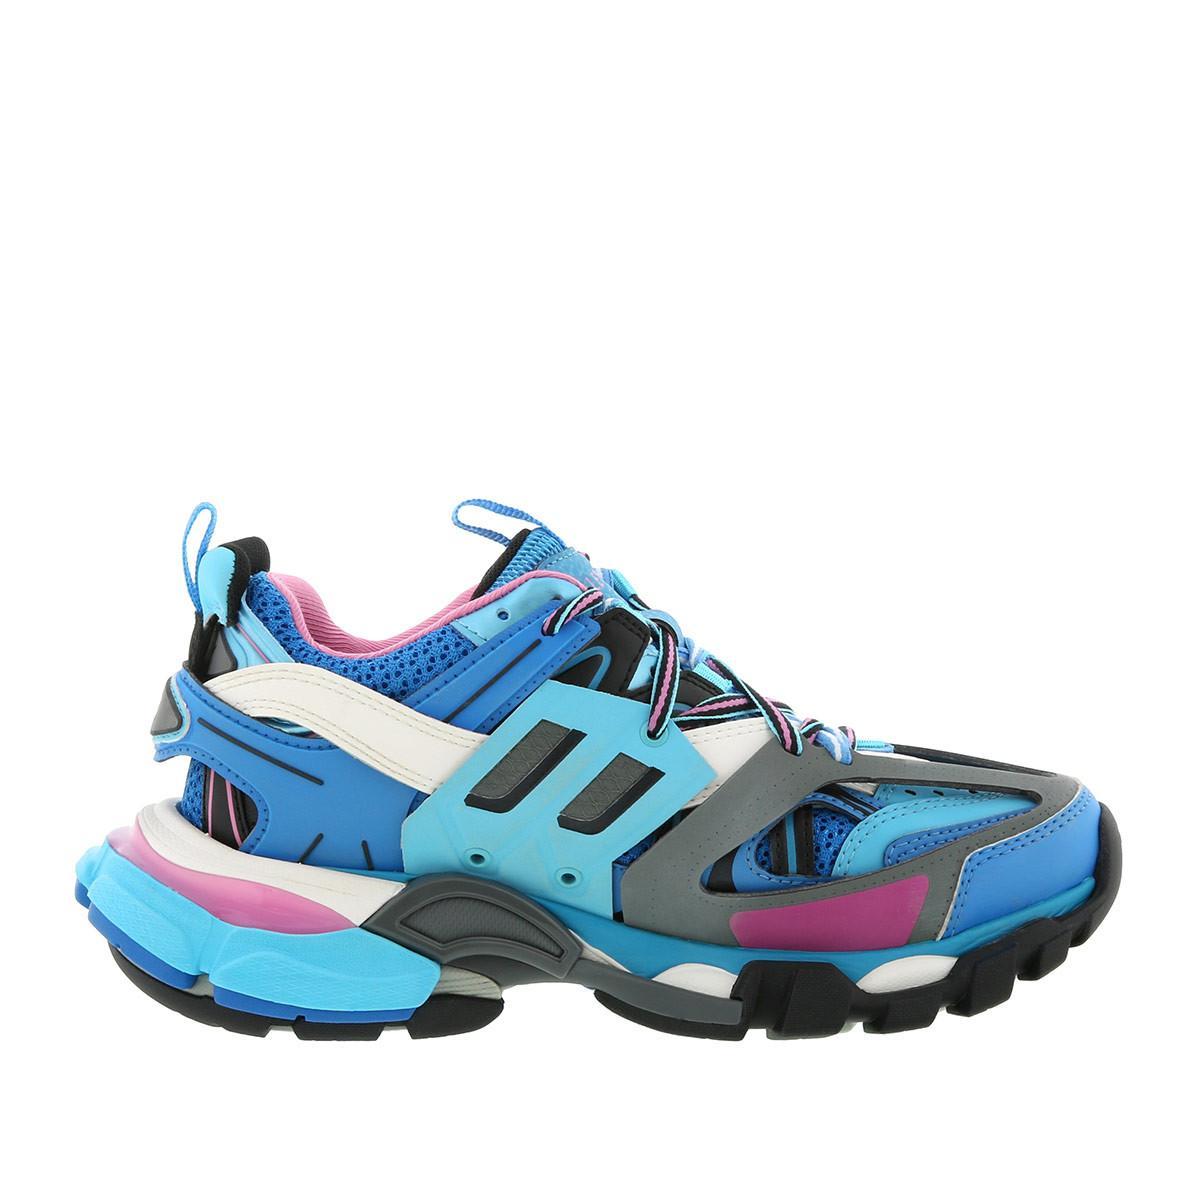 f74ead41331c2 Balenciaga - Track Trainers Blue - Lyst. View fullscreen